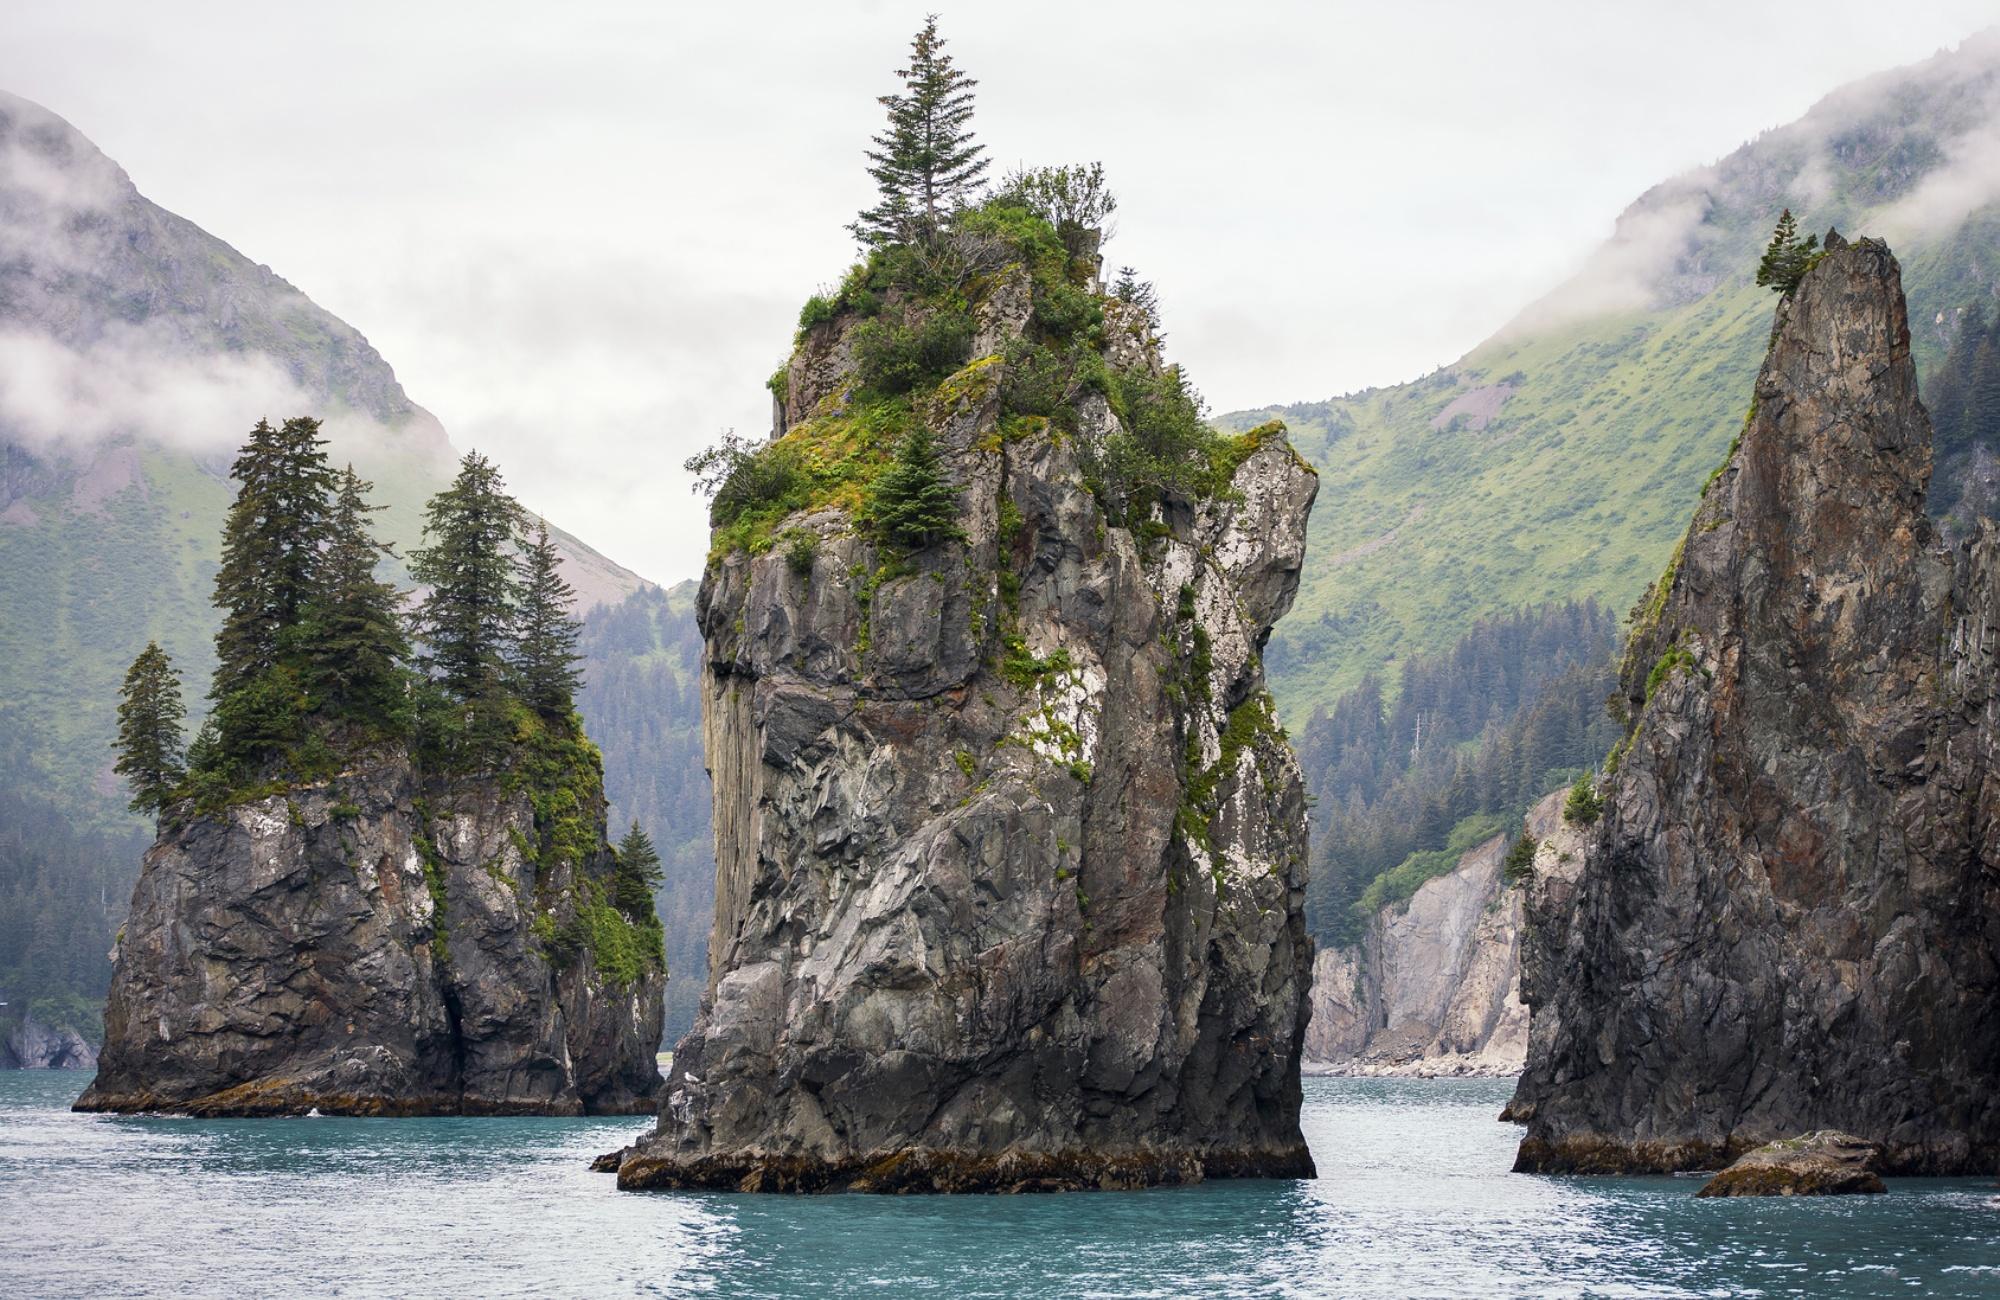 Voyage Alaska - kenai-fjords-national-park-alaska - Amplitudes